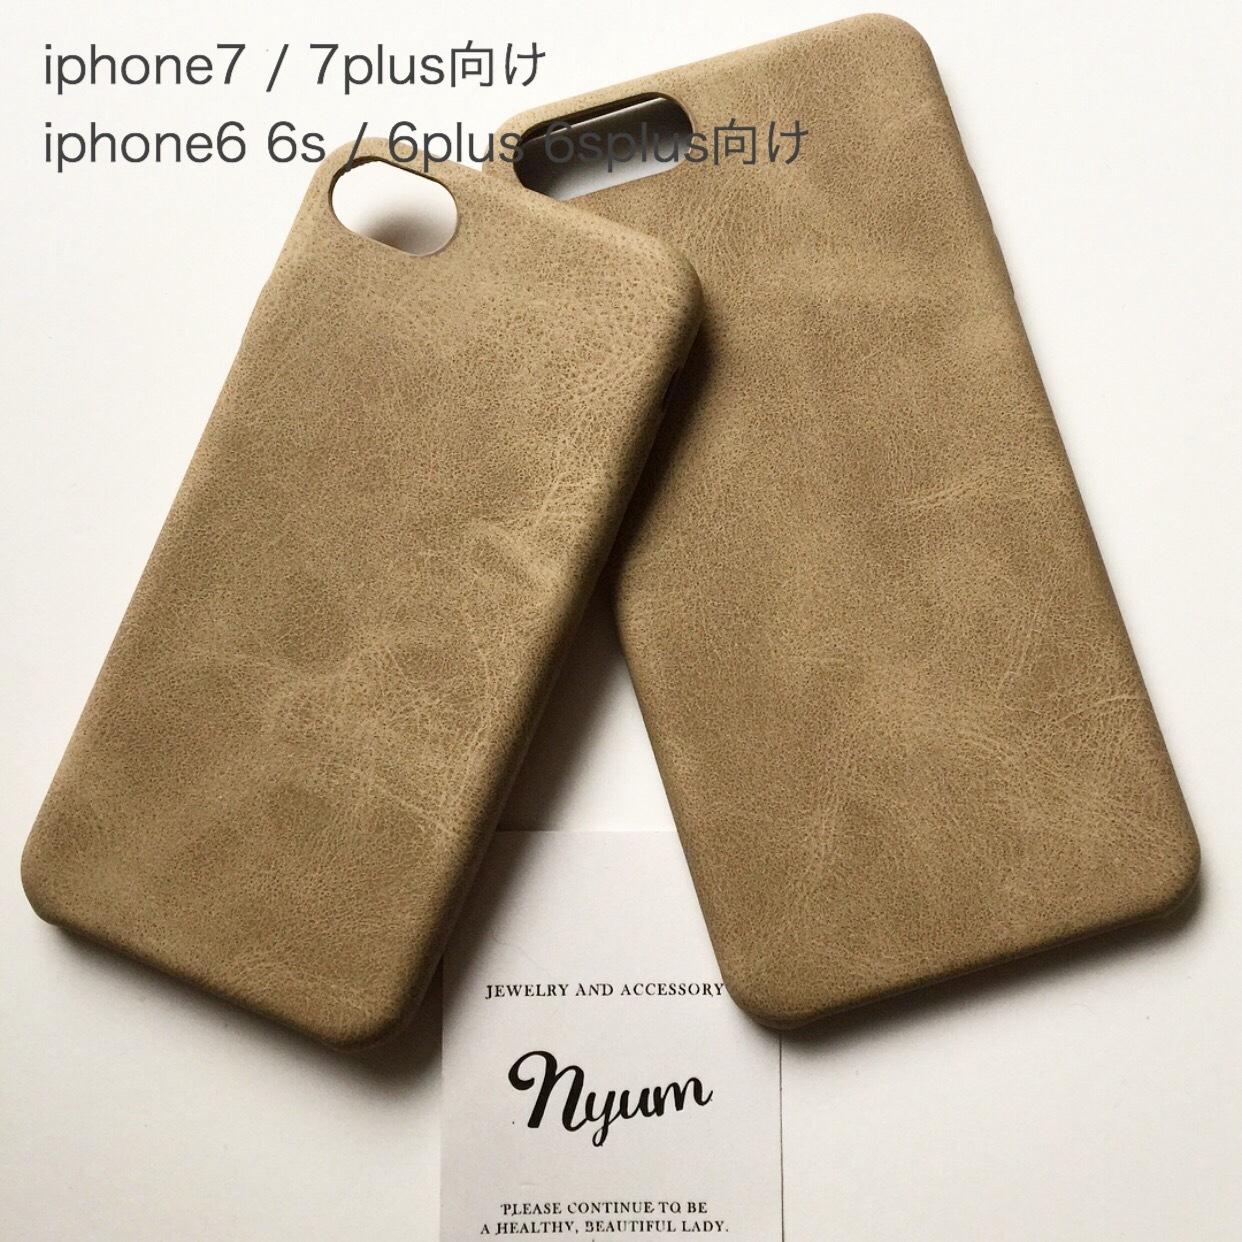 【iphone6plus/6splusカバー】レザー調iphoneケース グレージュ